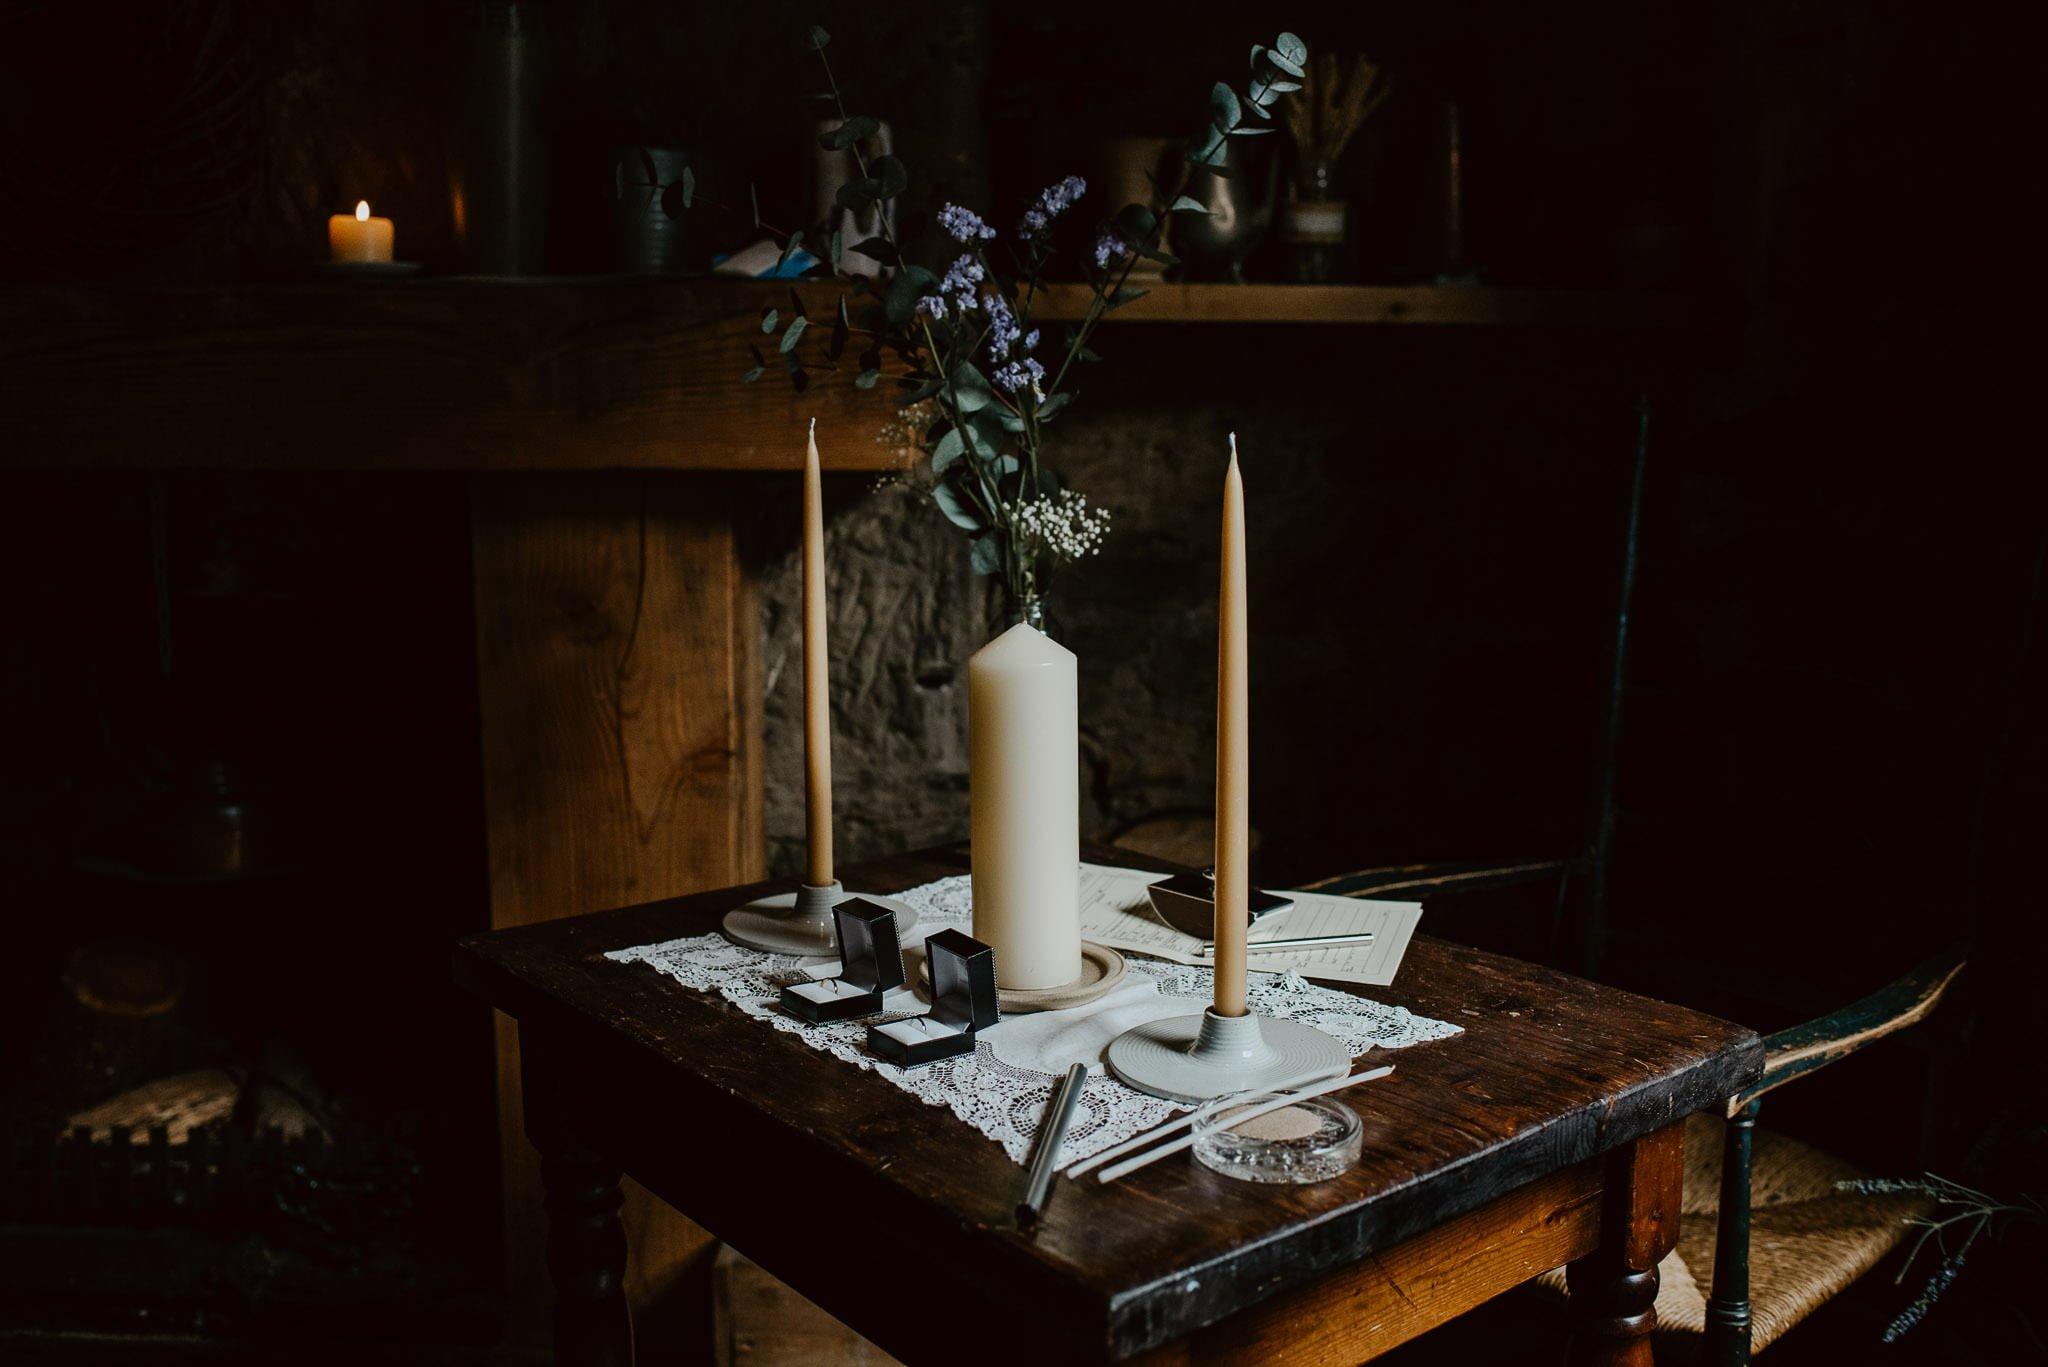 A Dreamy Pre-Raphaelite Wedding at the Bothy in Glasgow 4